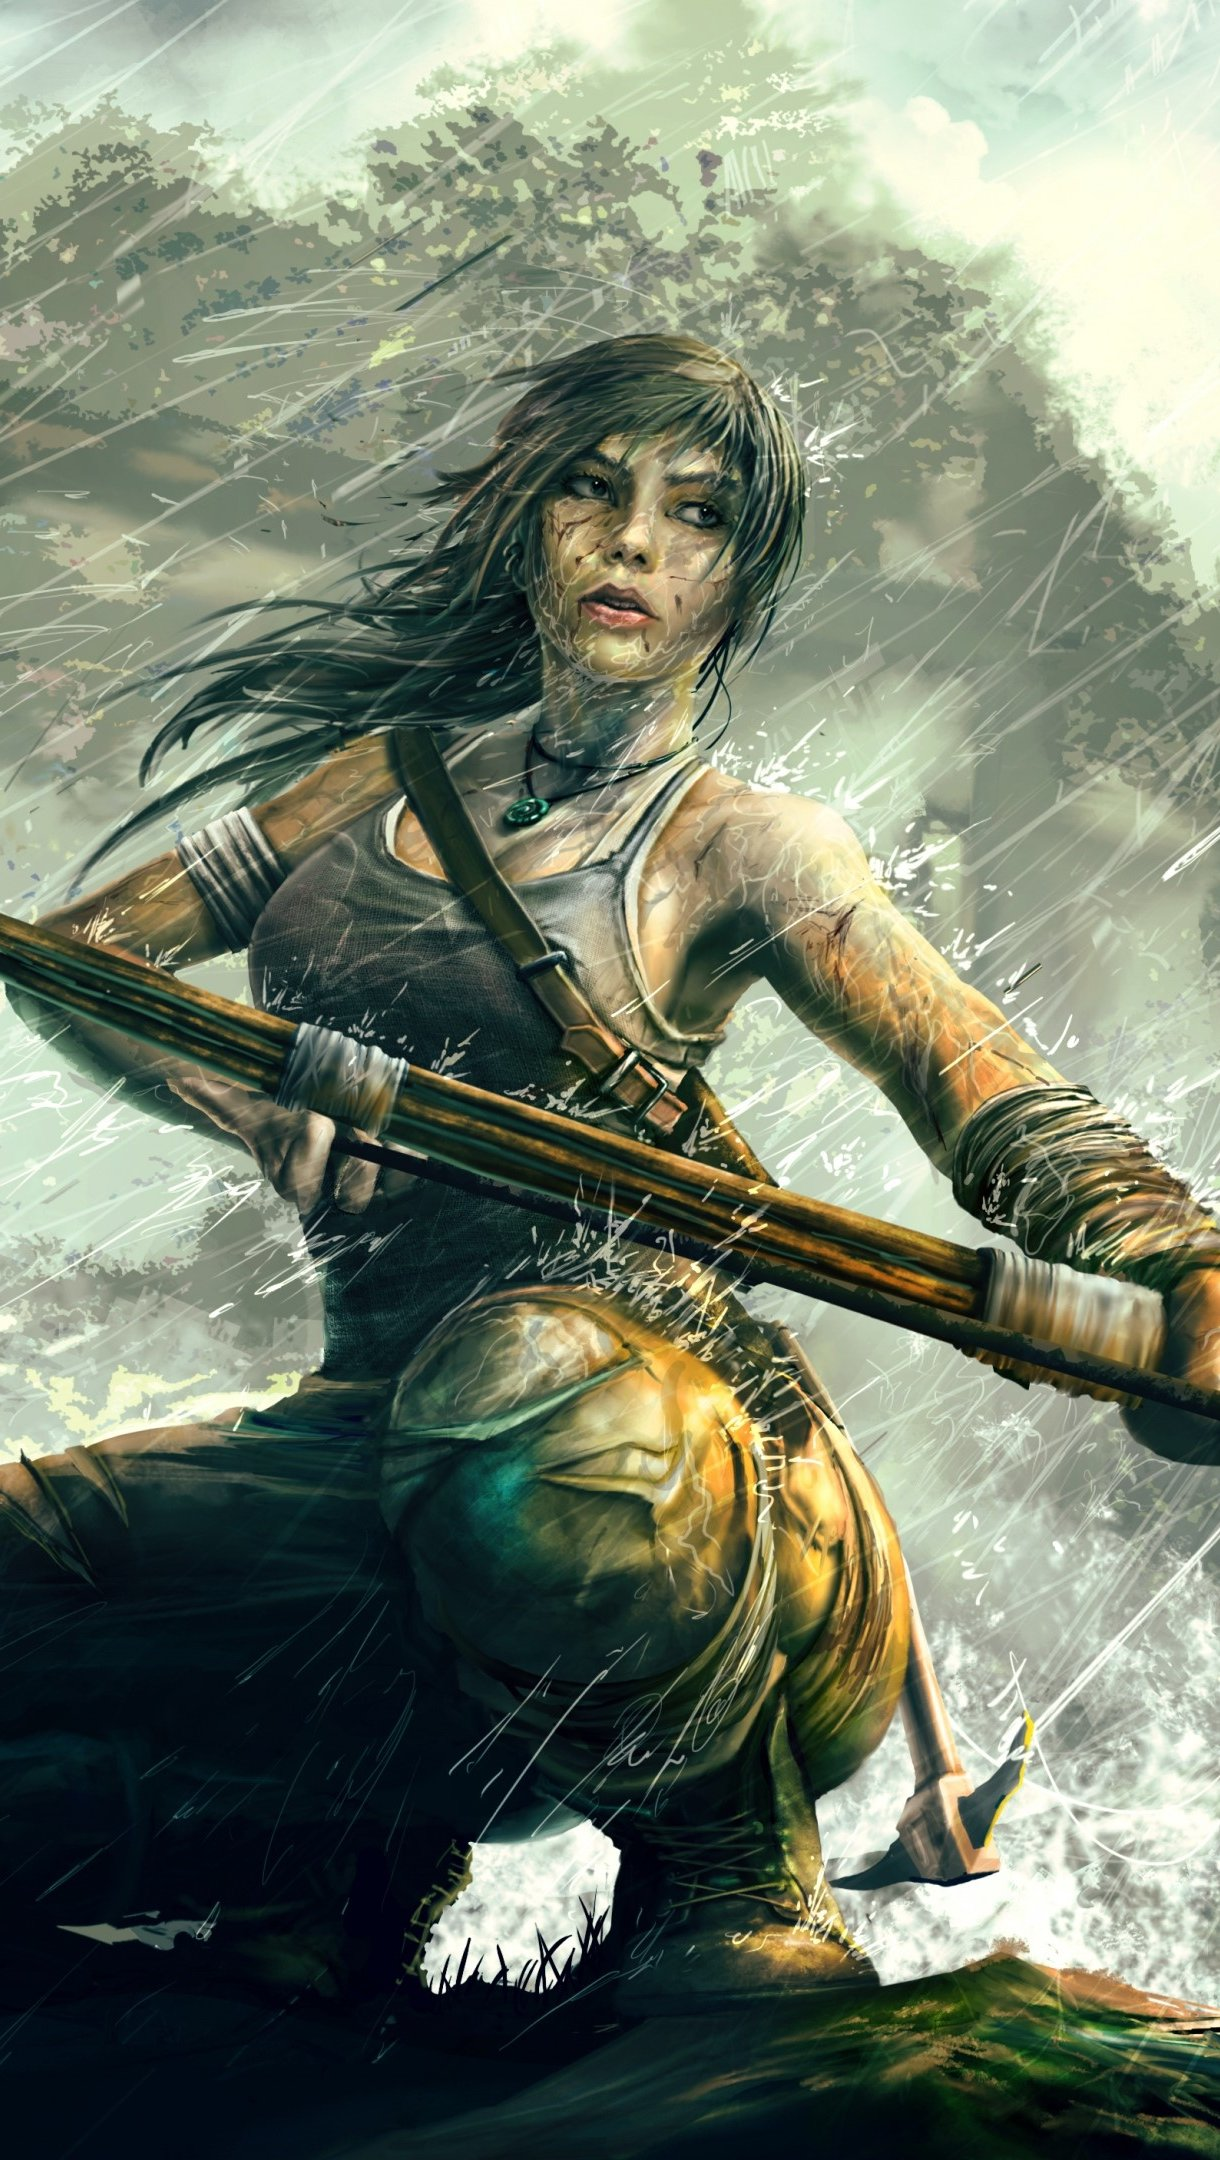 Wallpaper Tomb Raider Reborn Lara Croft Art Vertical